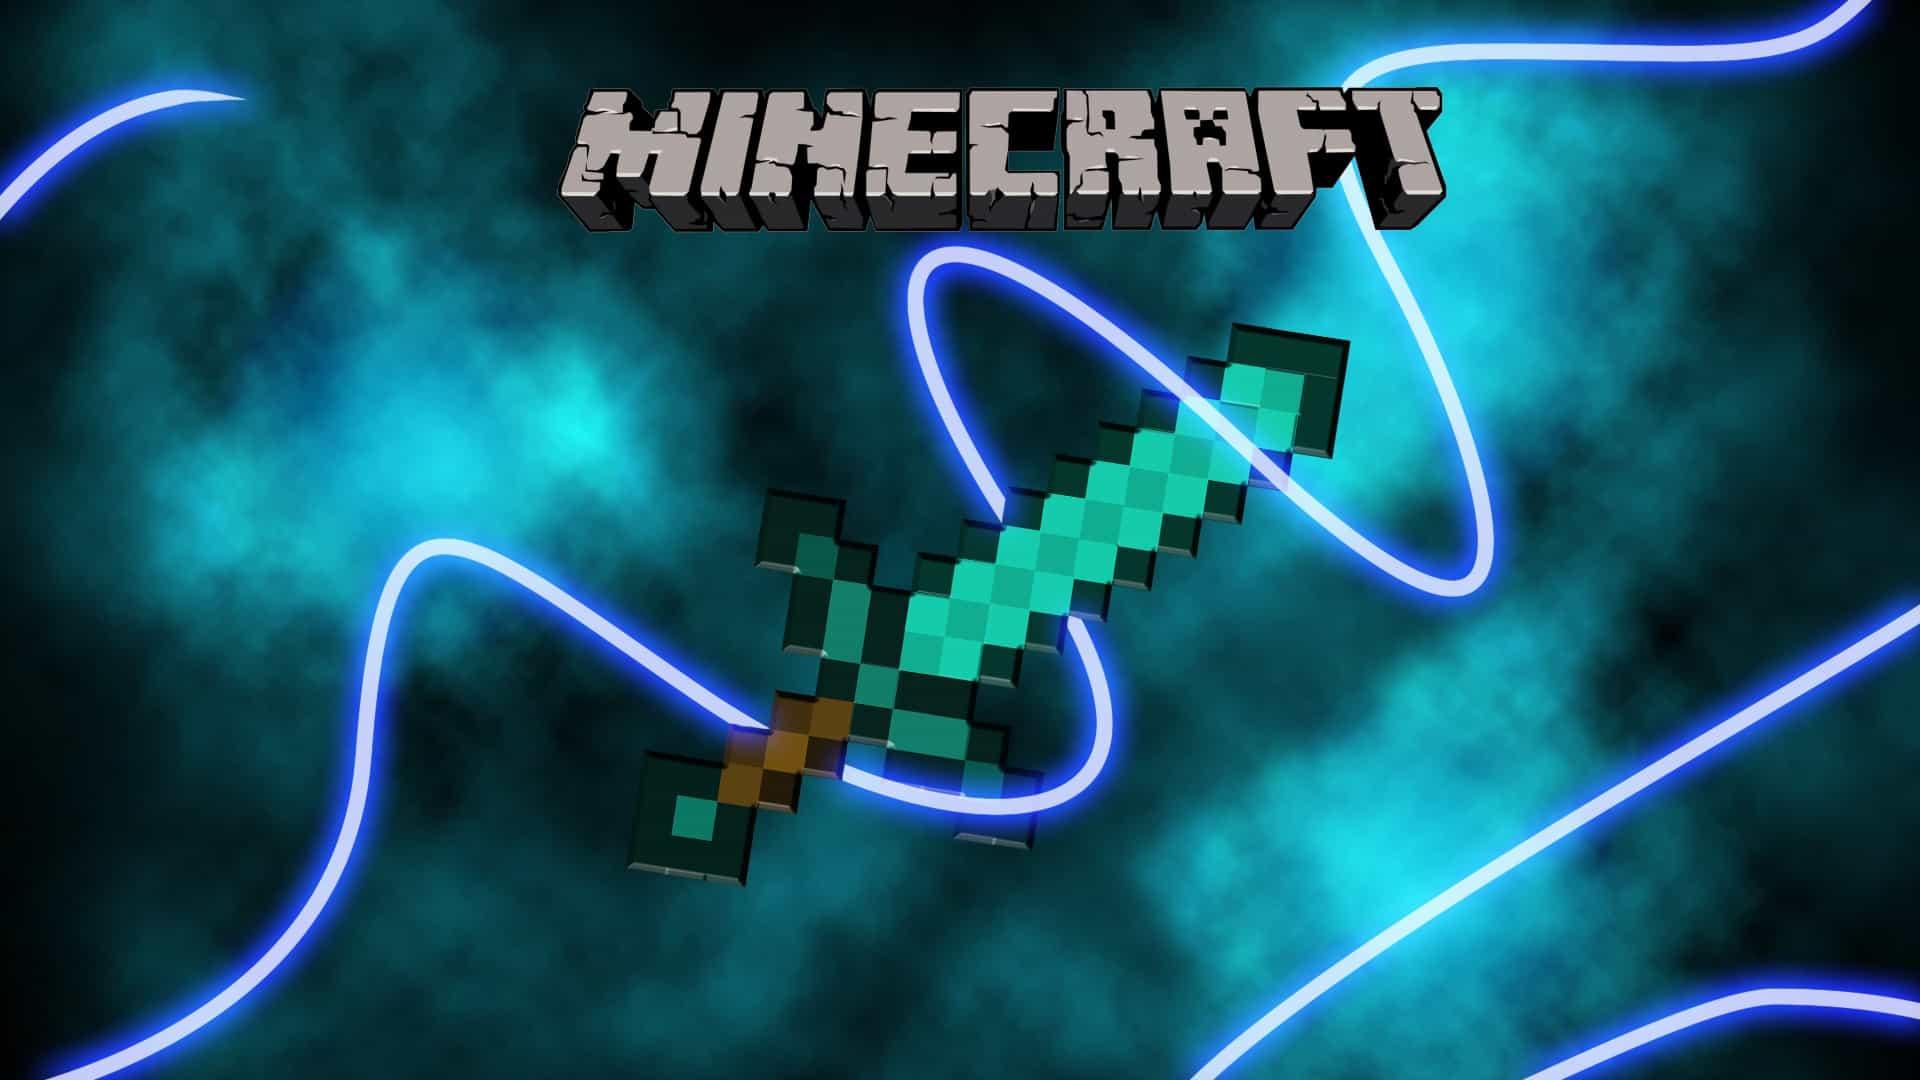 Minecraft diamond sword wallpaper glow electric